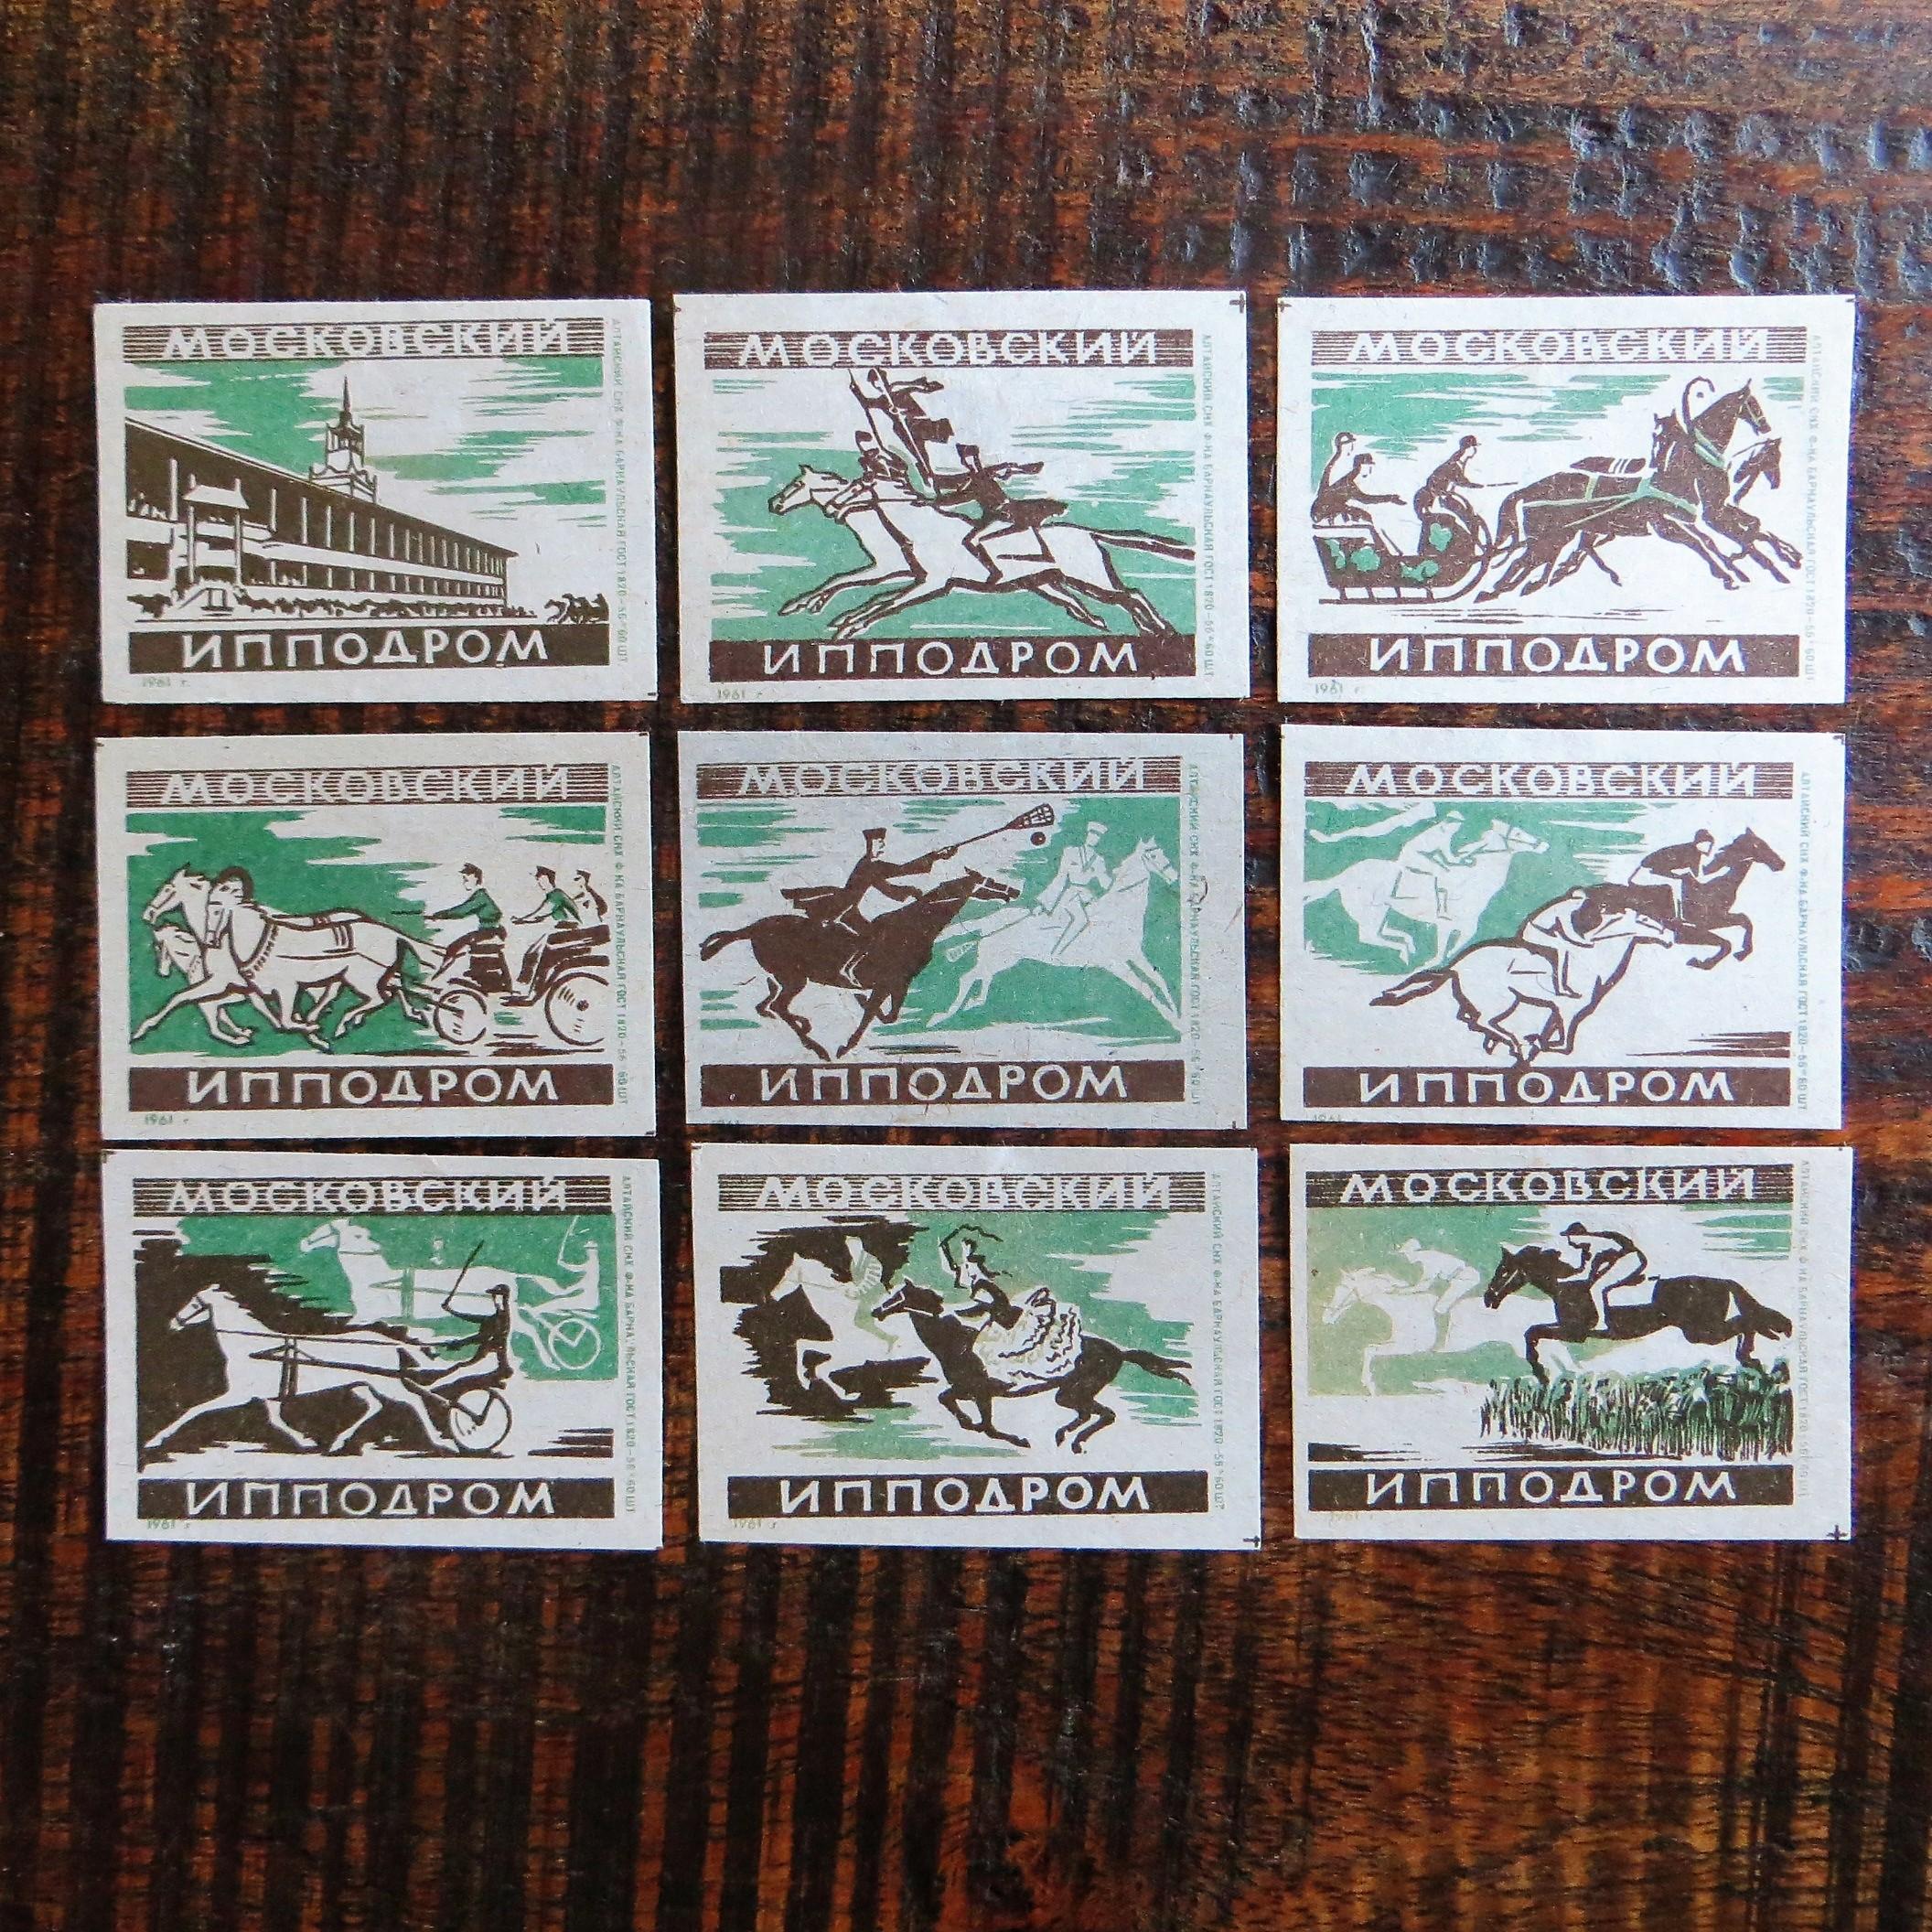 matchbox-labels-soviet-russia-1